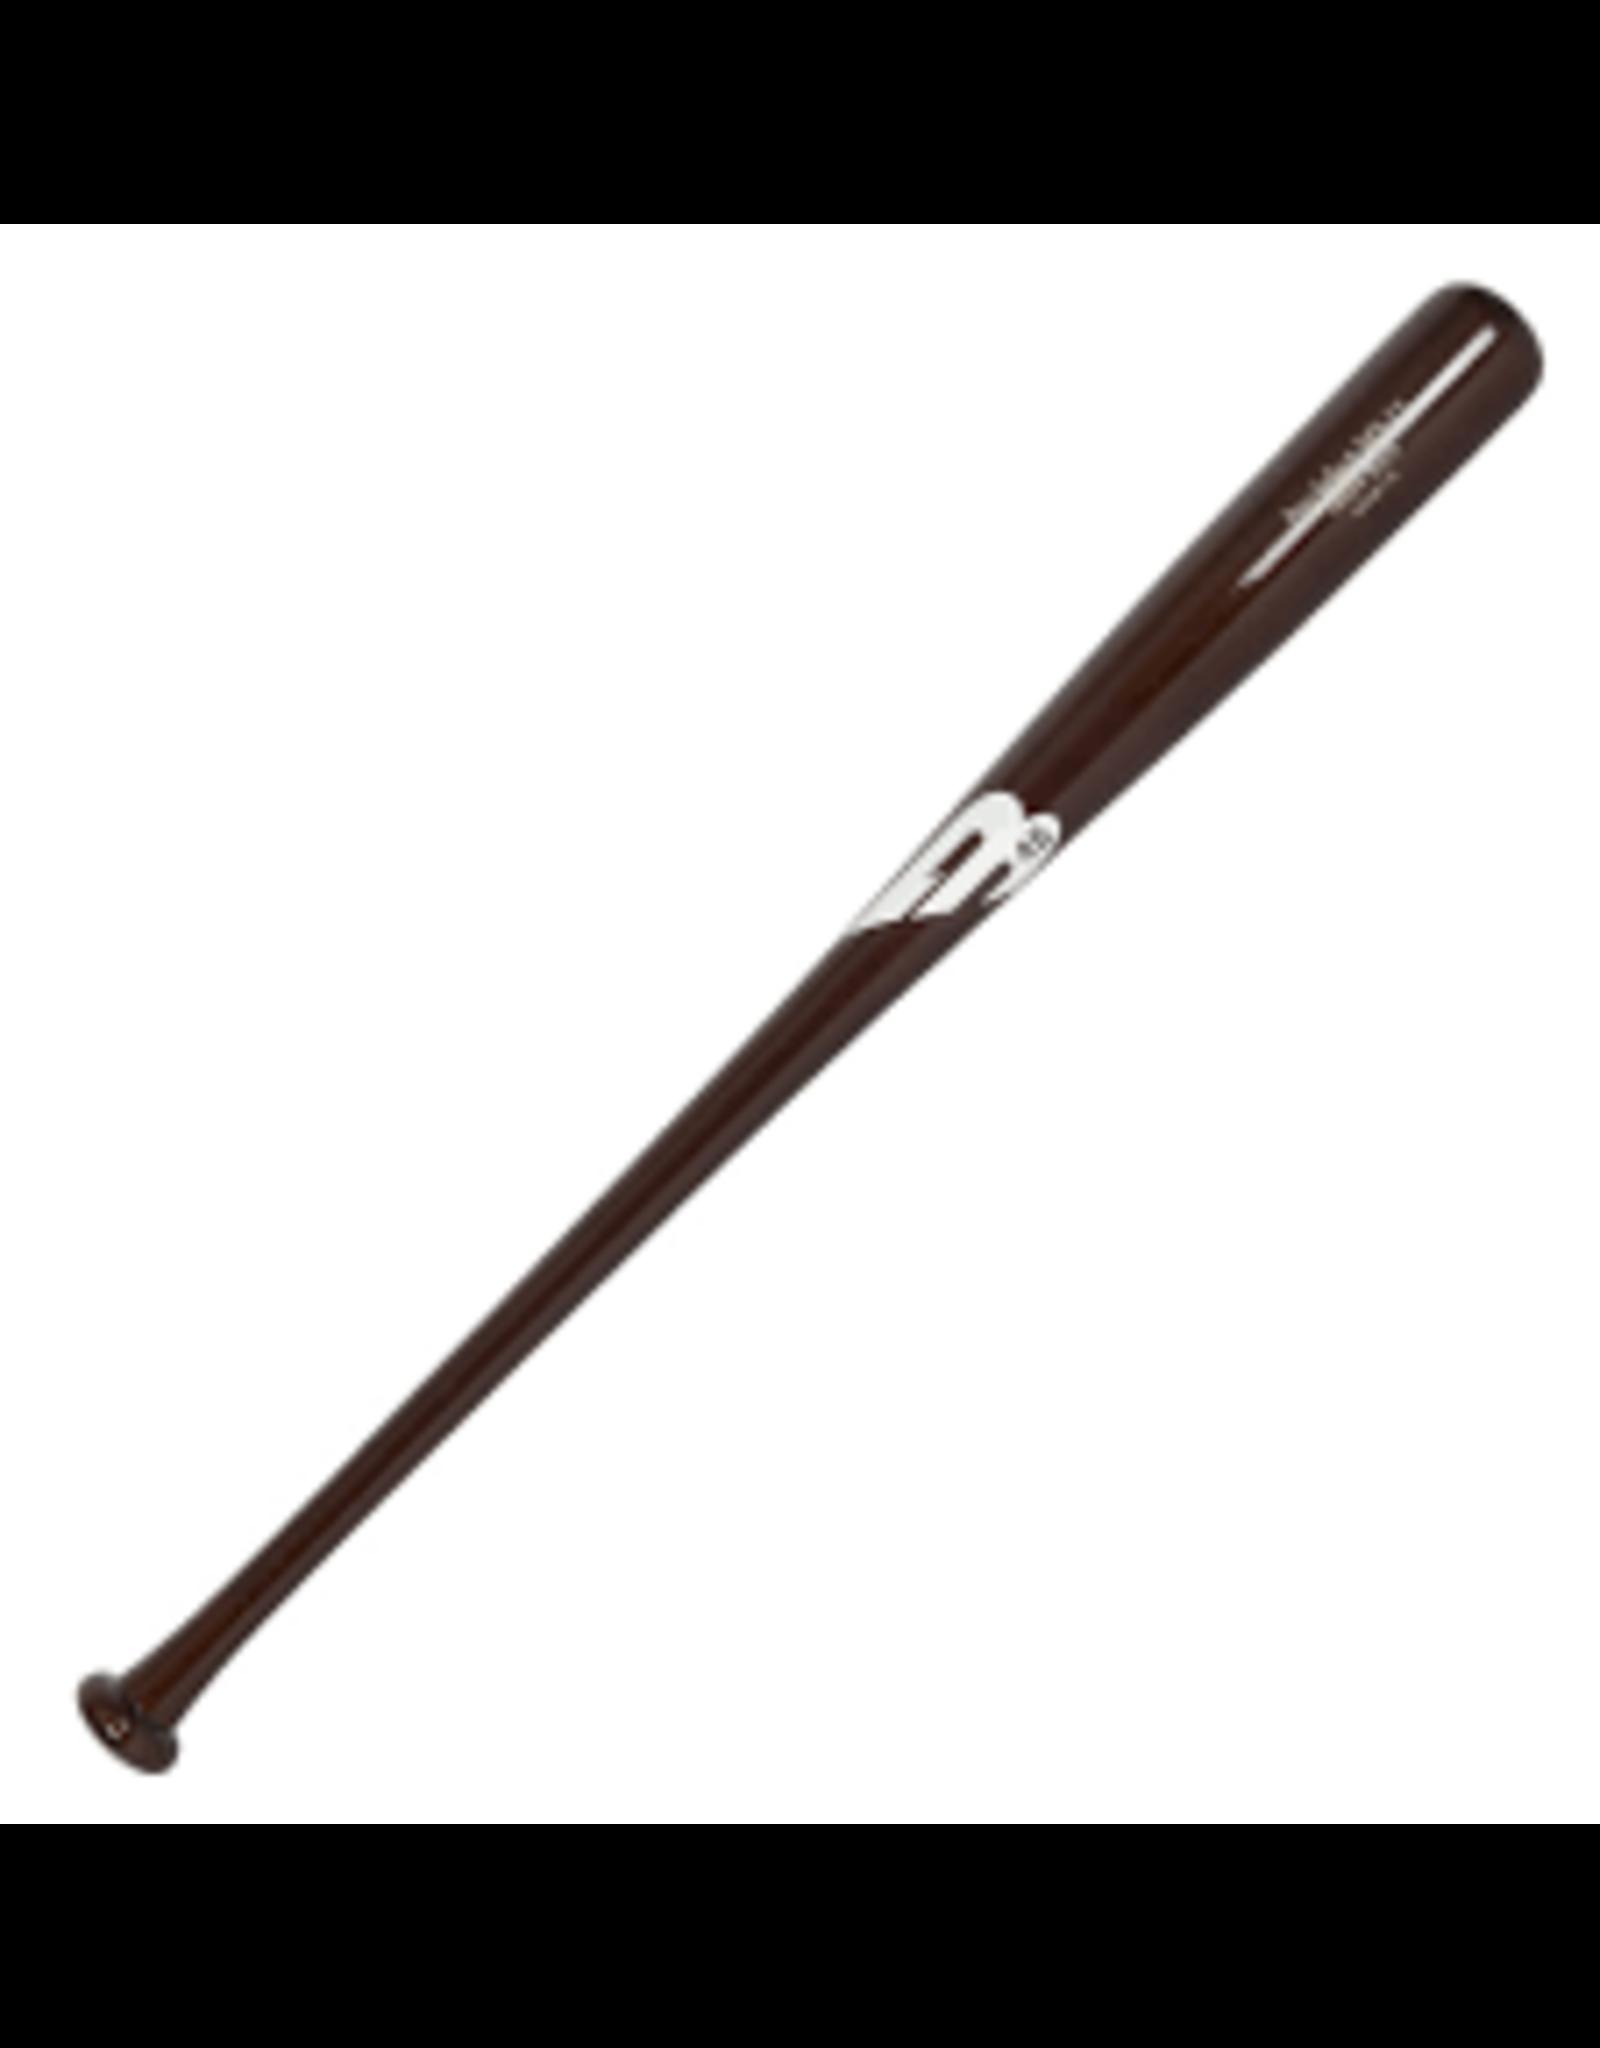 B45 B45 - Baton Pro-Select Brun Adulte - Modele TJ19 (34-31)